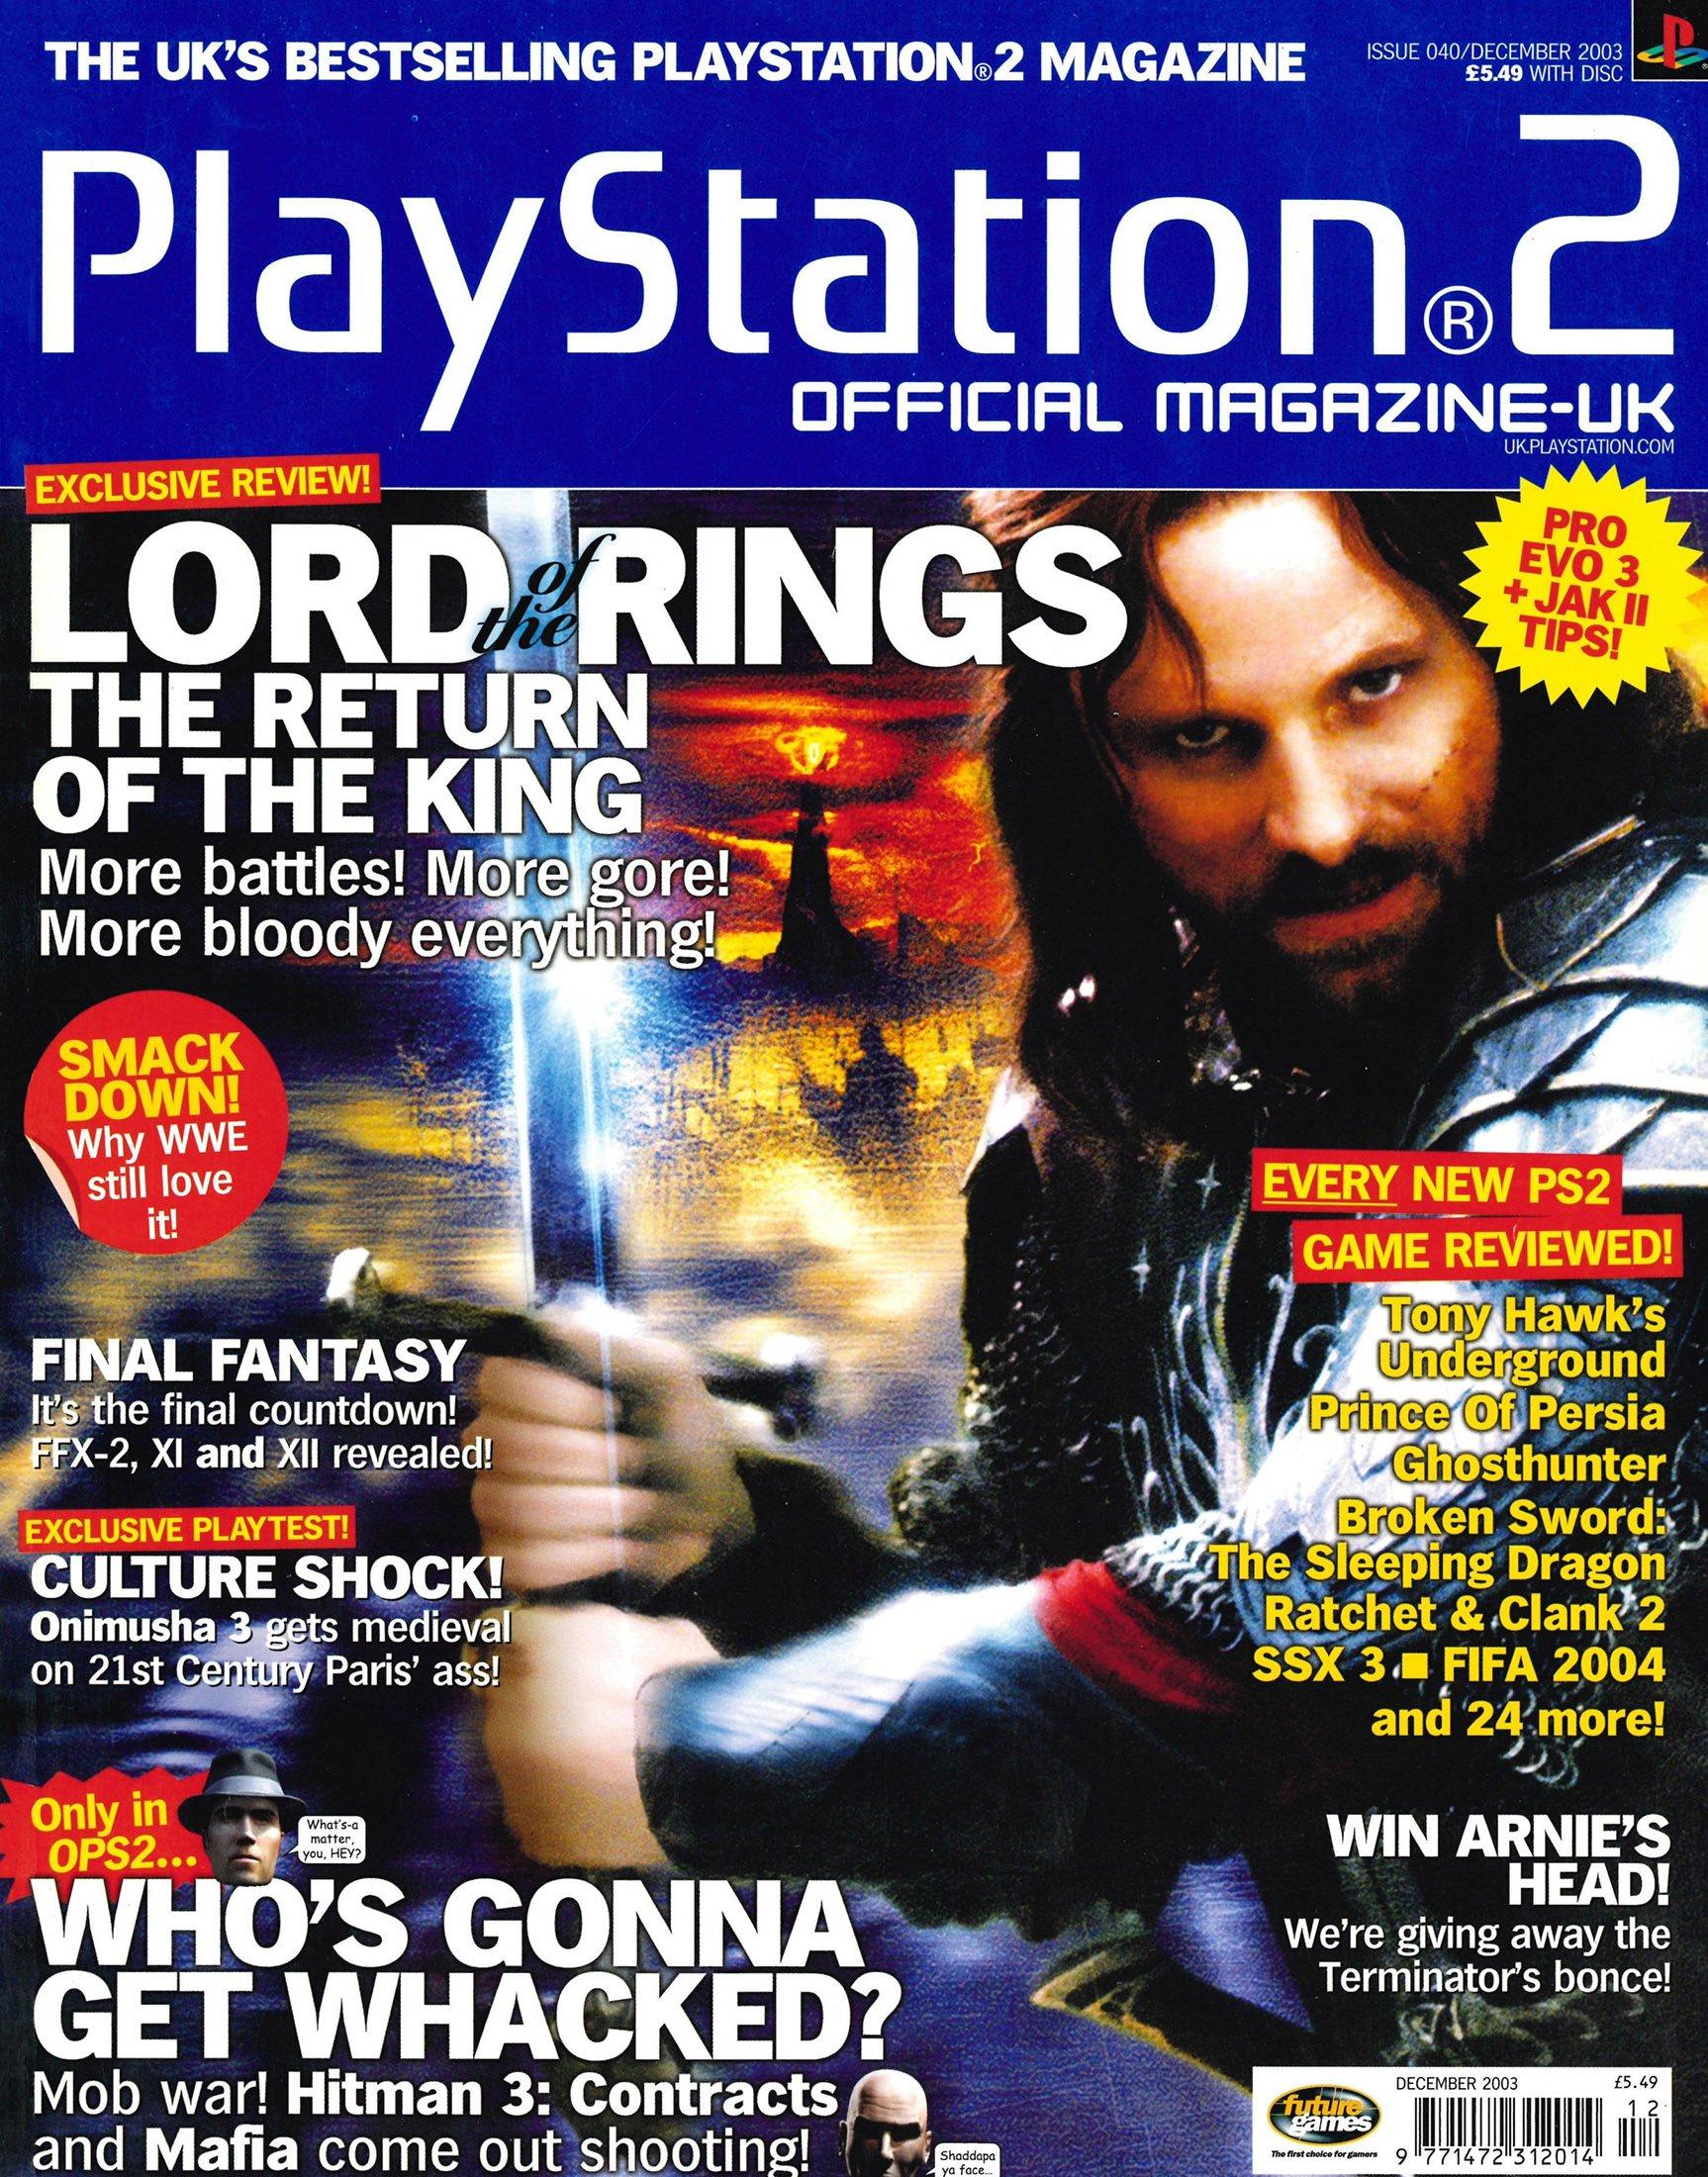 Official Playstation 2 Magazine UK 040 (December 2003)